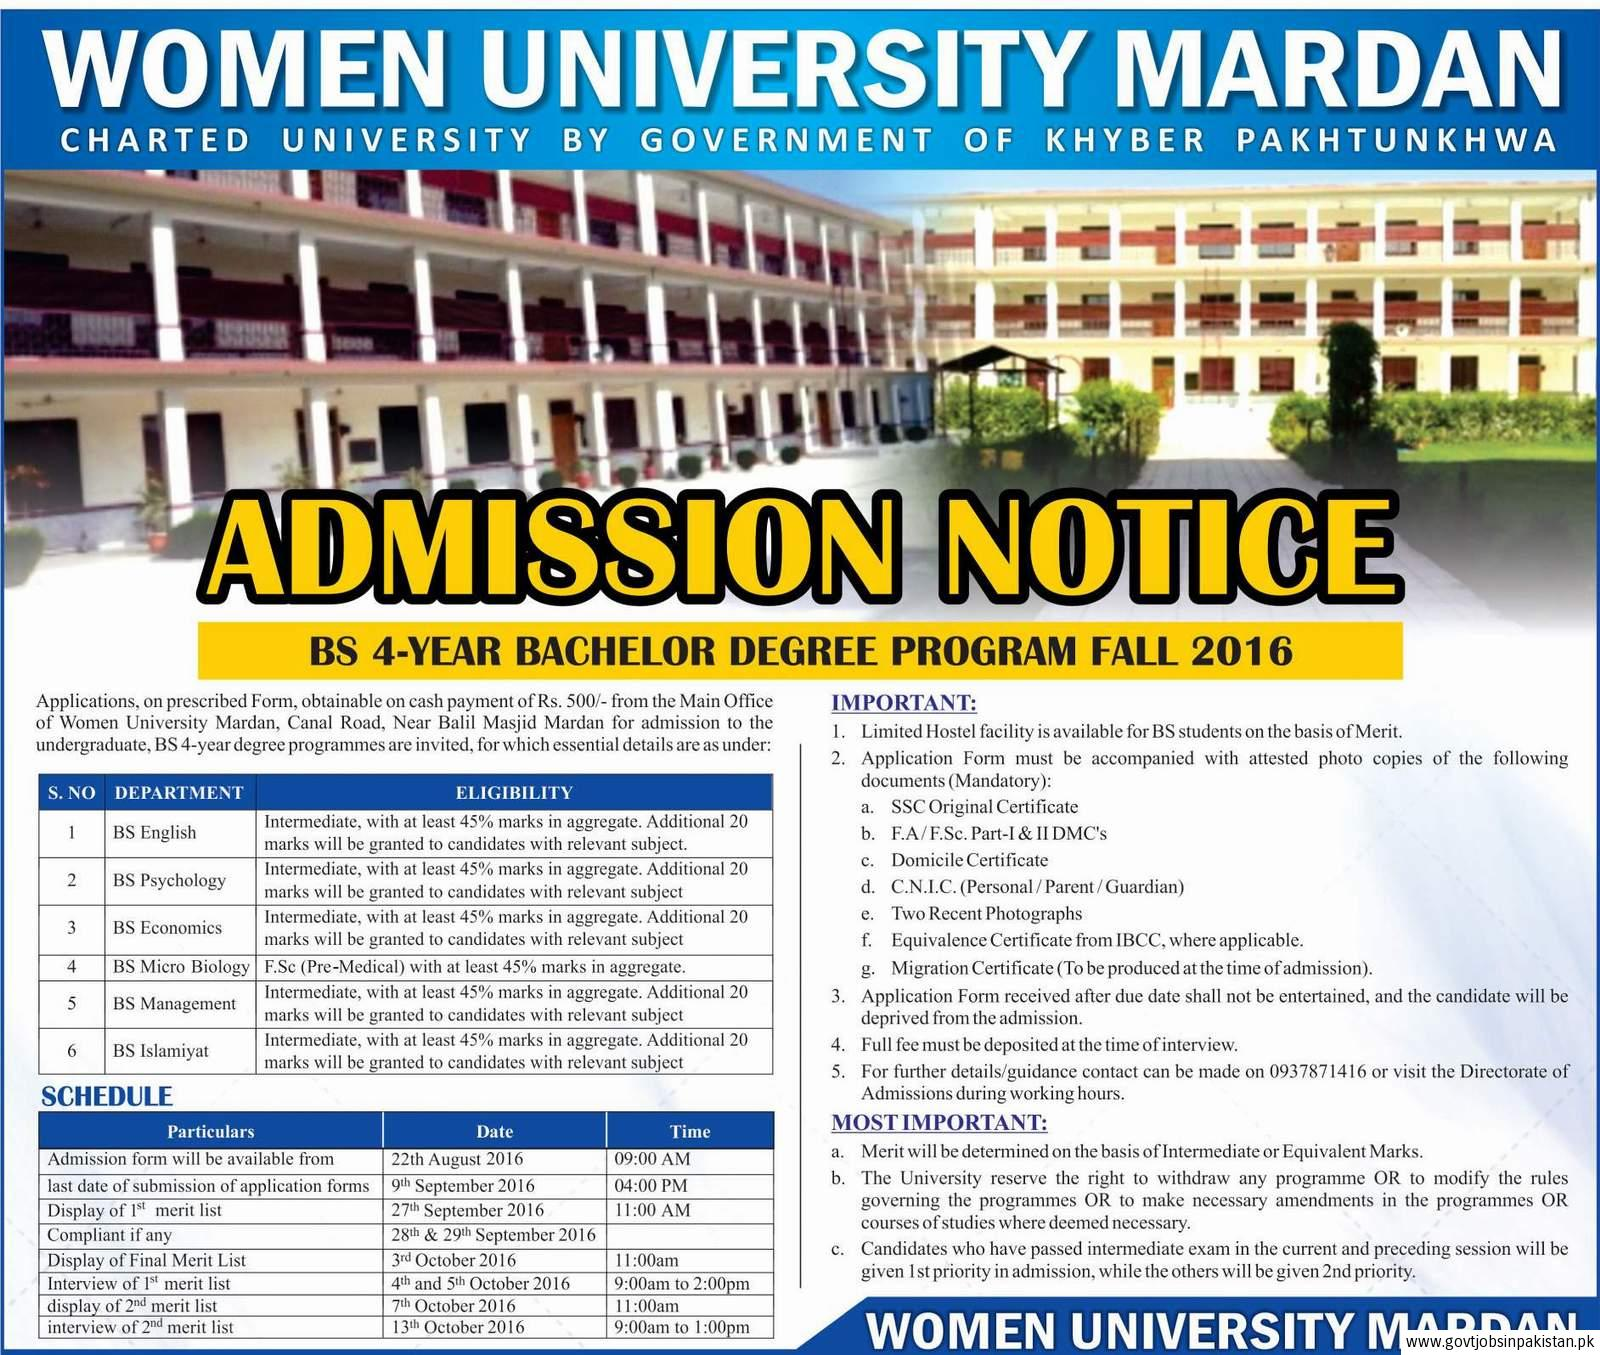 Women University Mardan admisssions fall spring